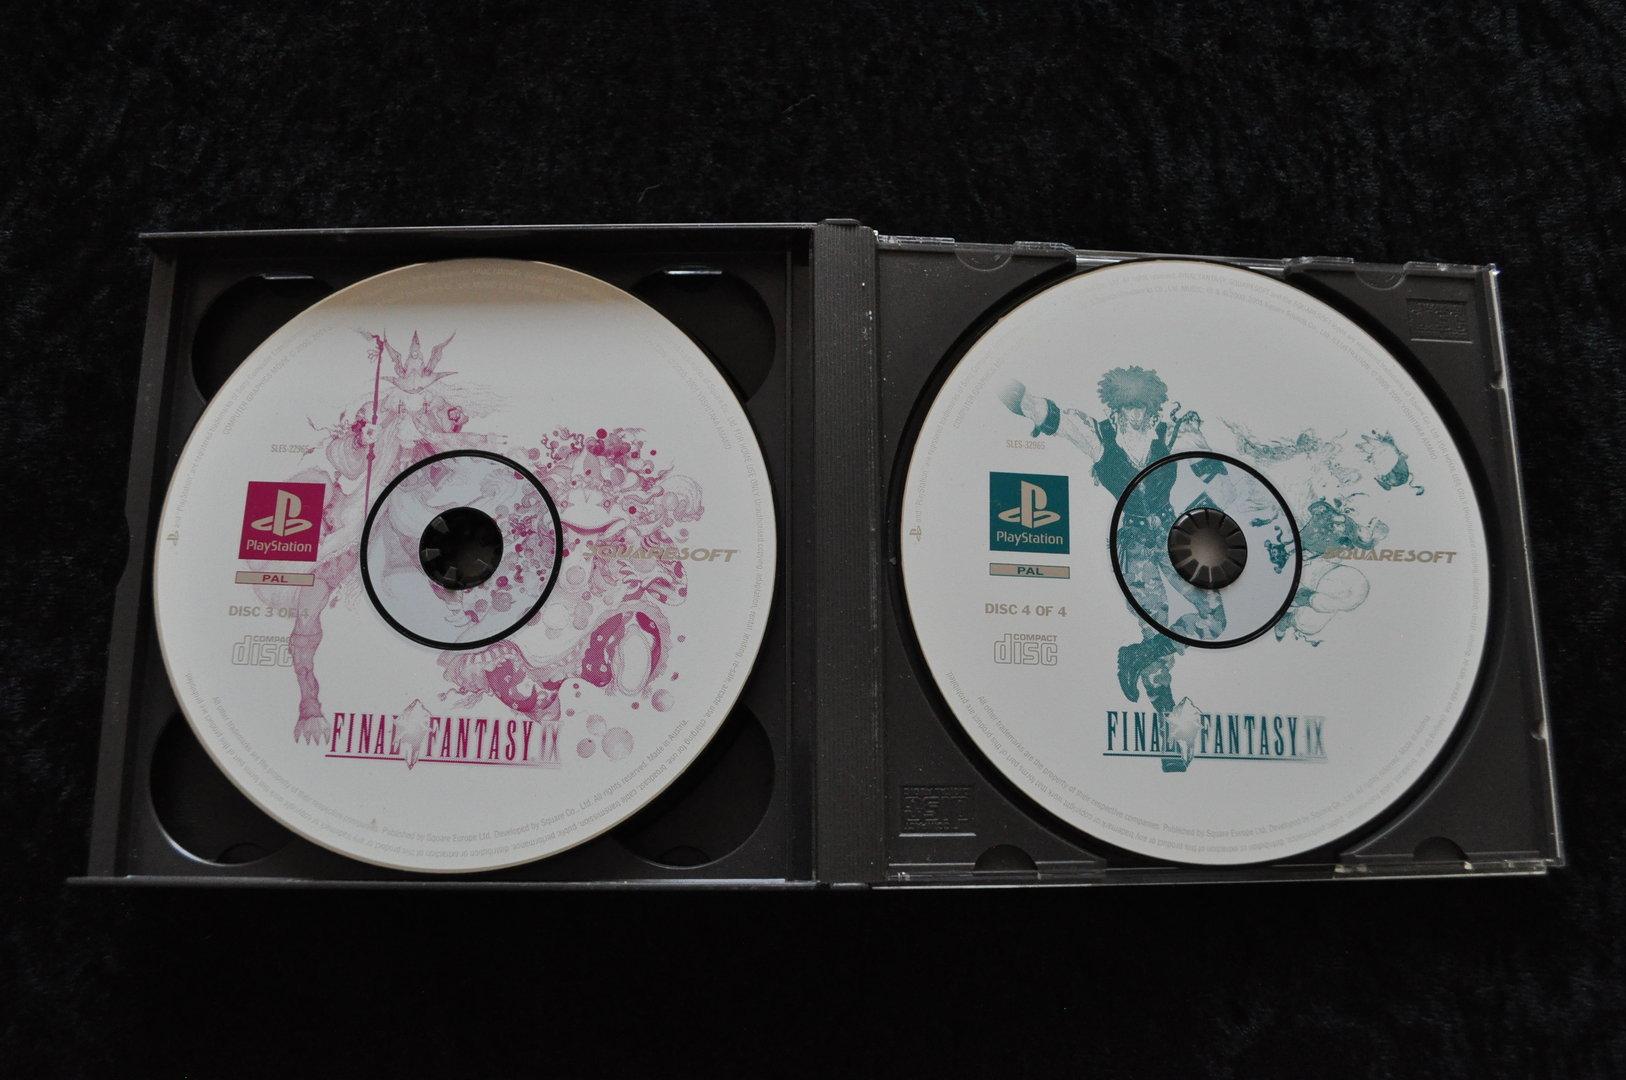 Final Fantasy 9 No Manual Playstation 1 PS1 - Retrogameking